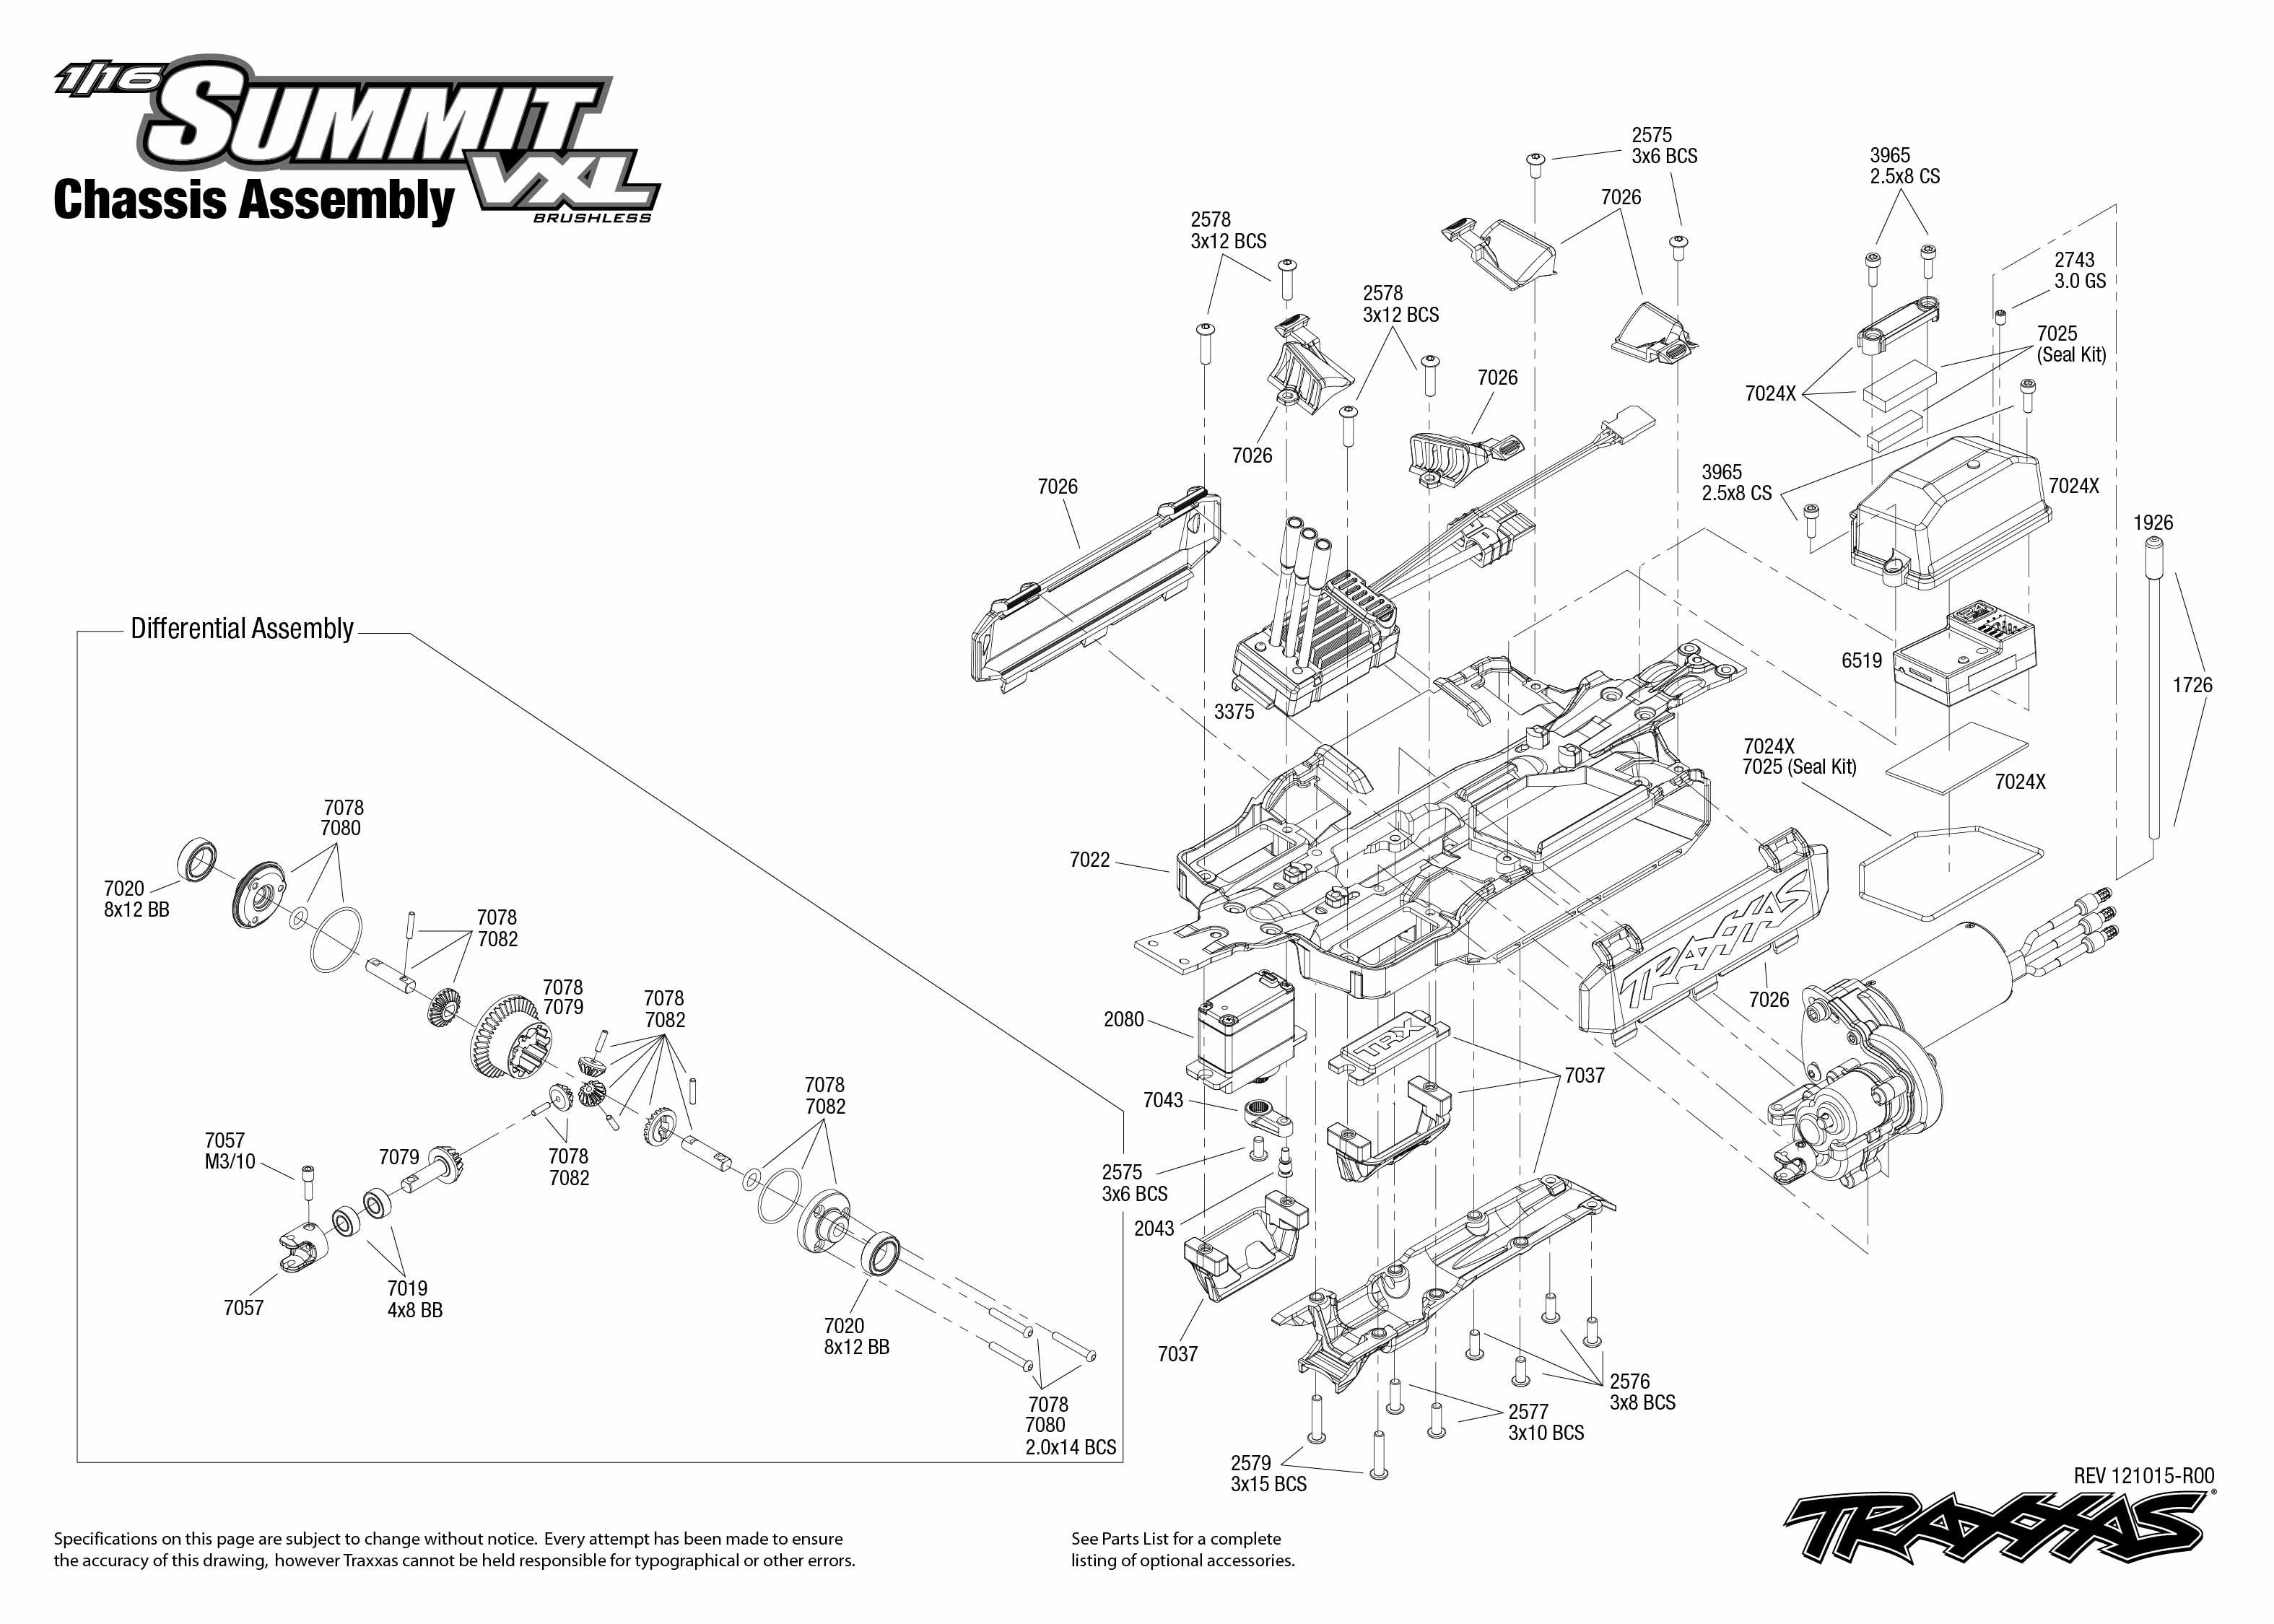 traxxas revo 3 parts diagram 700r4 converter lockup wiring 1/16 scale summit vxl 4wd extreme terrain monster truck - 72074